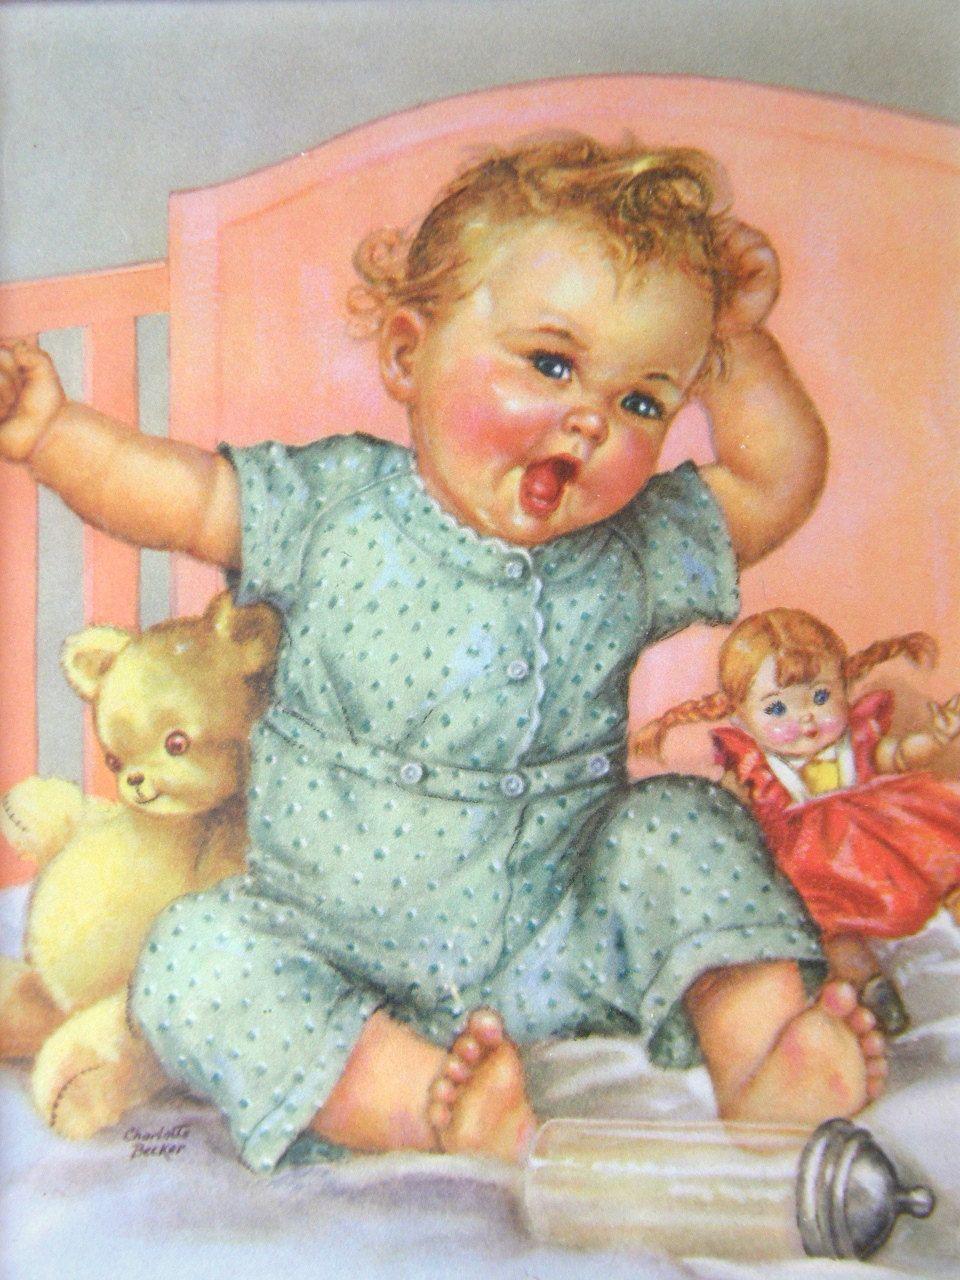 Charlotte Becker Chromolitho: 1940s Framed Baby Print, Pastel Cottage / Shabby Chic Decor.